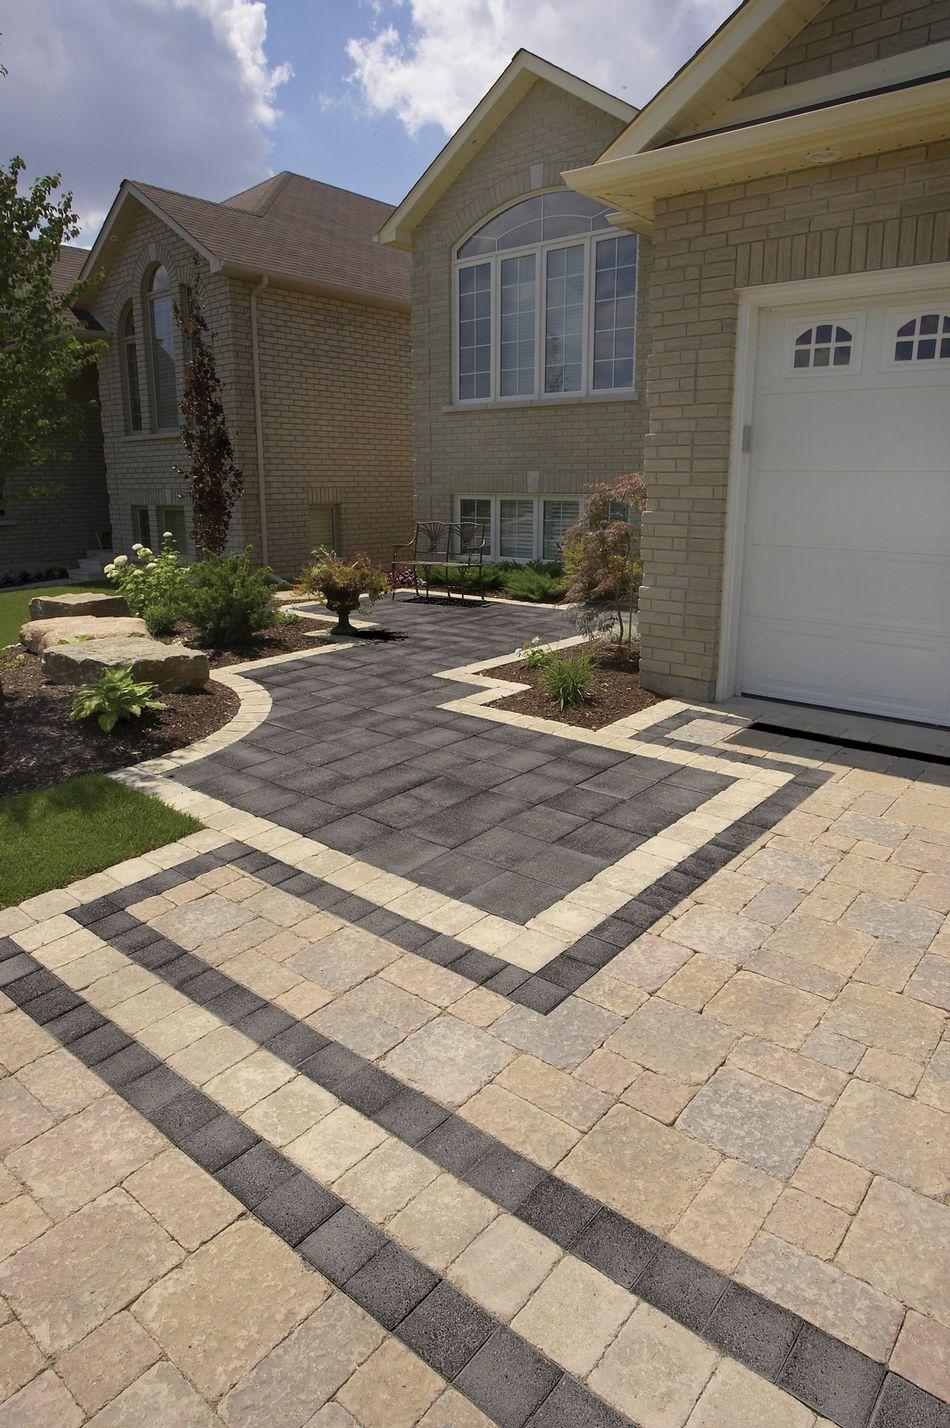 Unilock Brick Pavers | Driveway design, Front yard patio ... on Unilock Patio Ideas id=39573